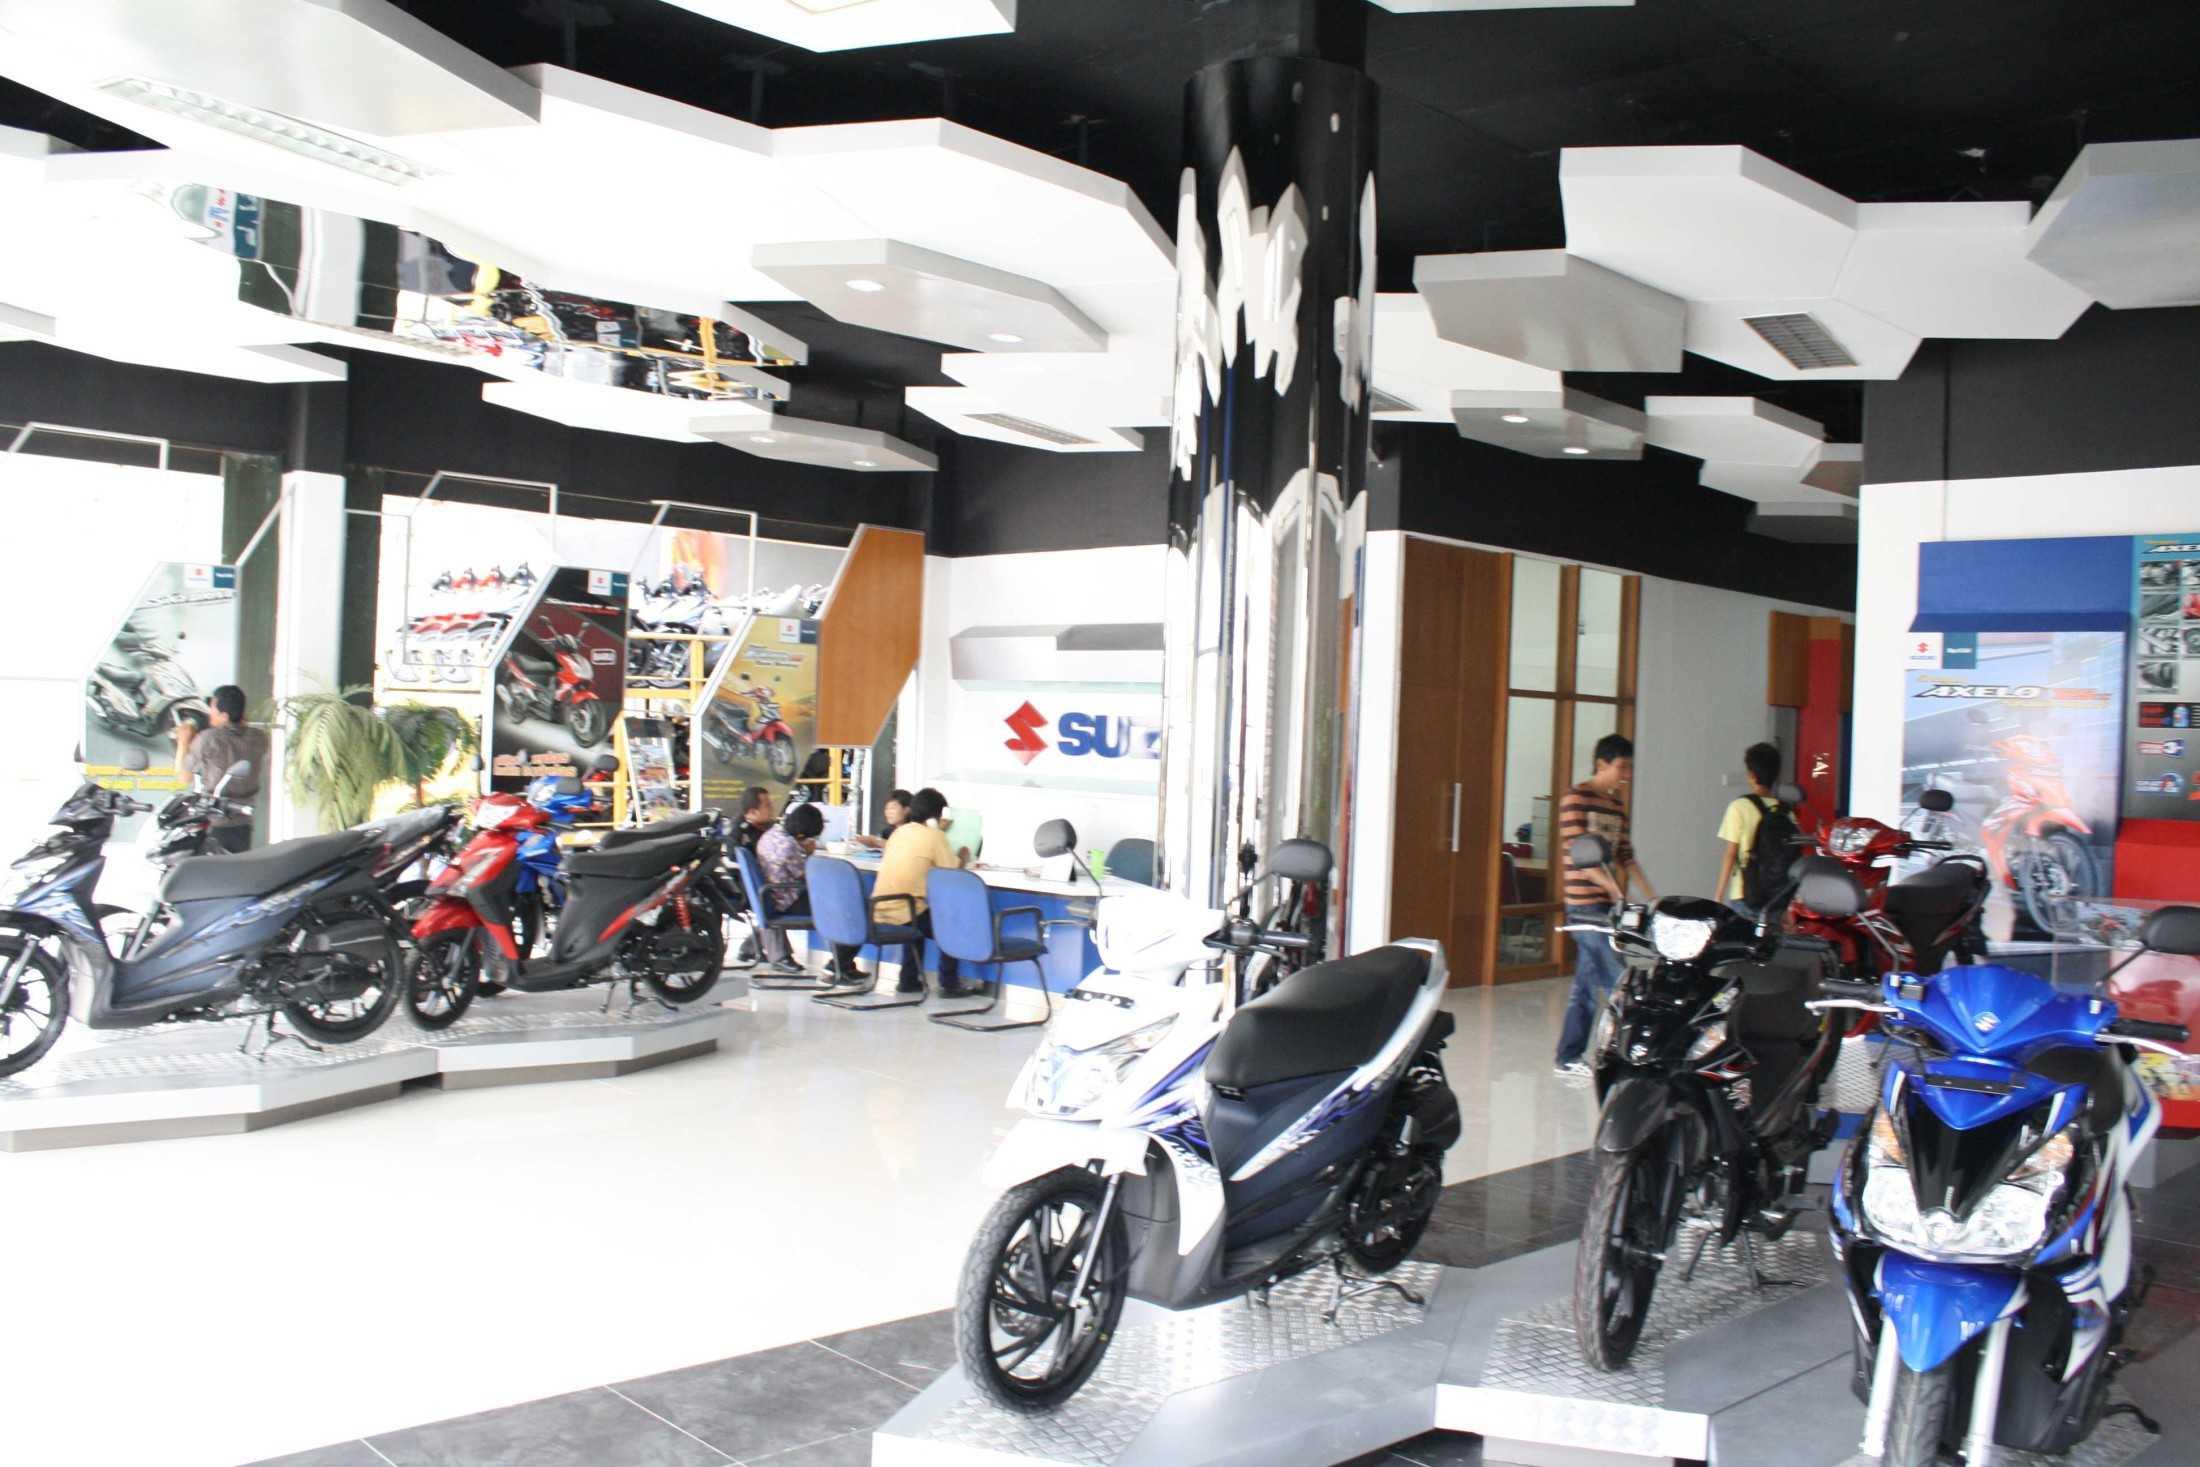 Im Design Associates Suzuki Showroom Kota Jakarta Pusat, Daerah Khusus Ibukota Jakarta, Indonesia Kota Jakarta Pusat, Daerah Khusus Ibukota Jakarta, Indonesia Im-Design-Associates-Suzuki-Showroom  73060